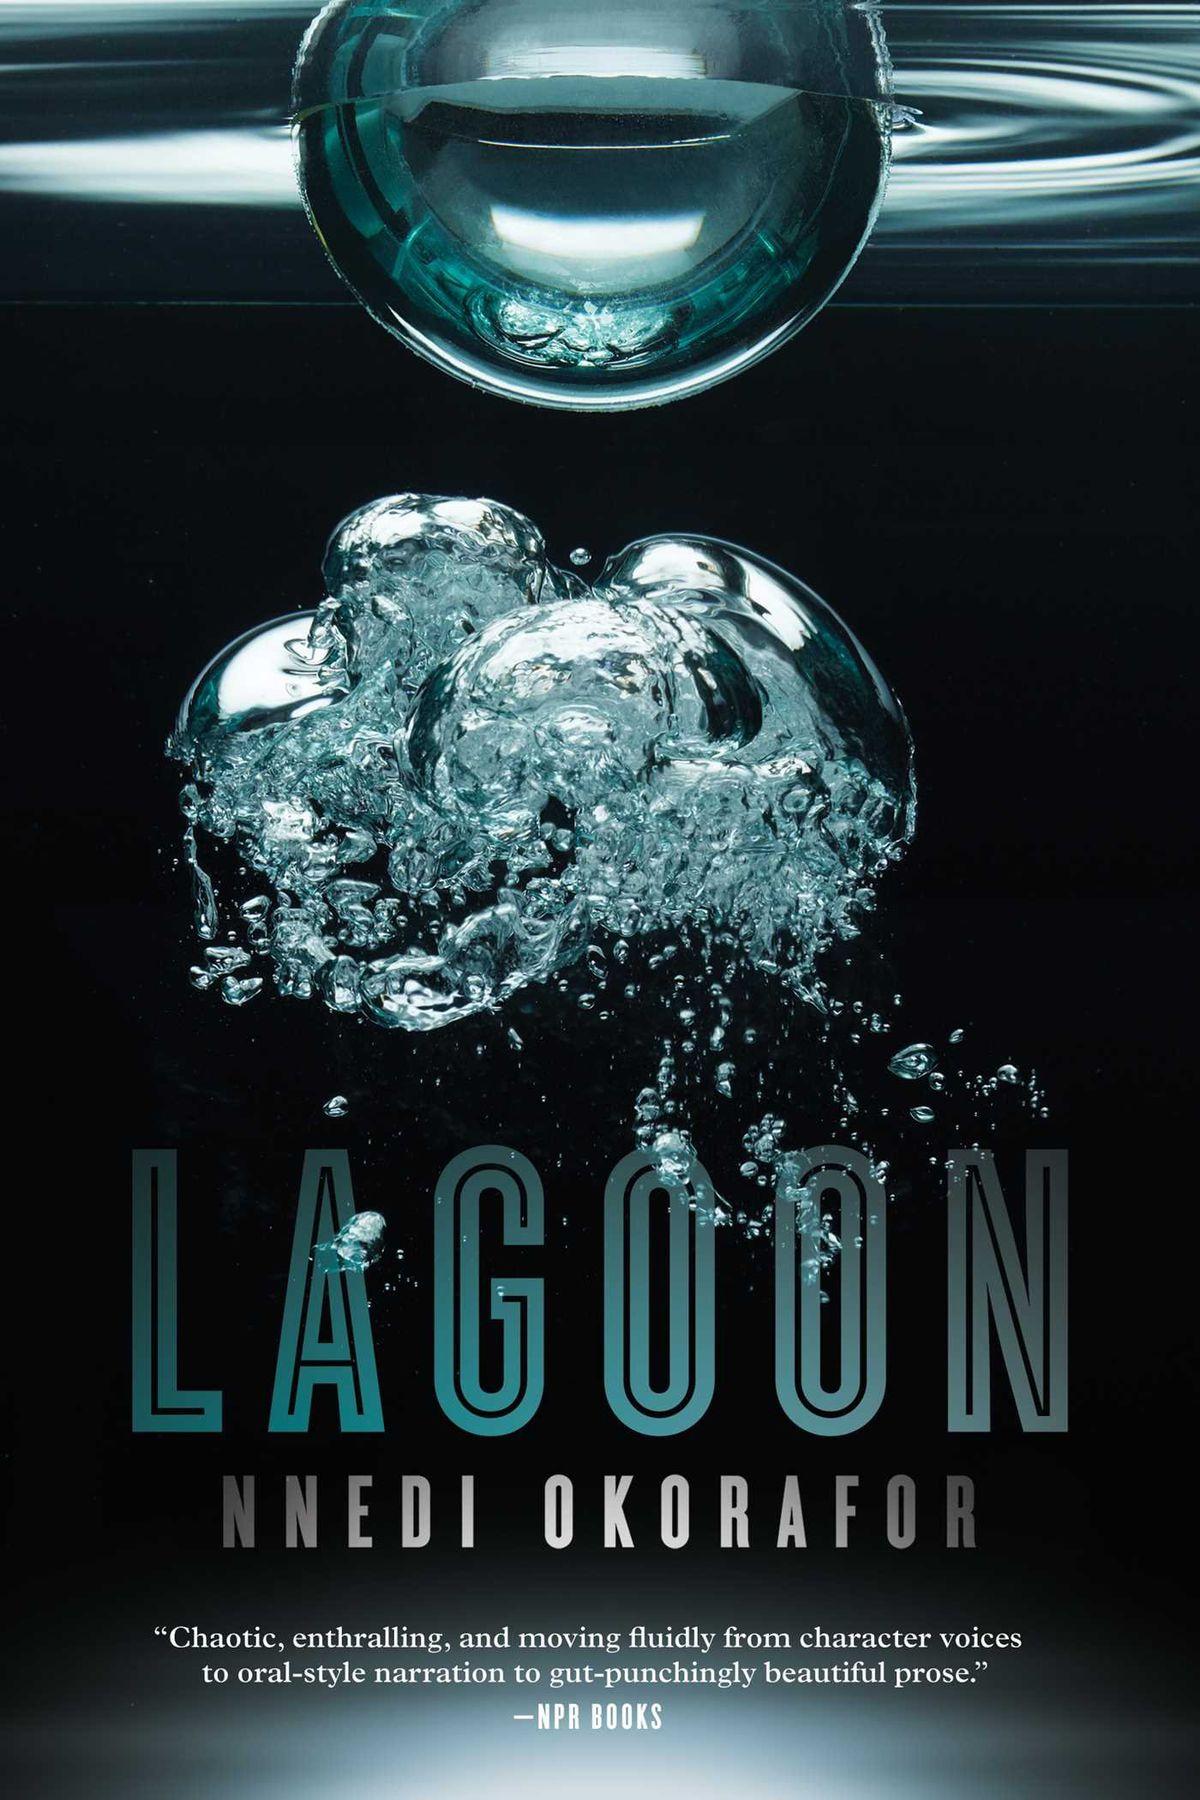 Lagoon by Nnedi Okorafor (2014) cover